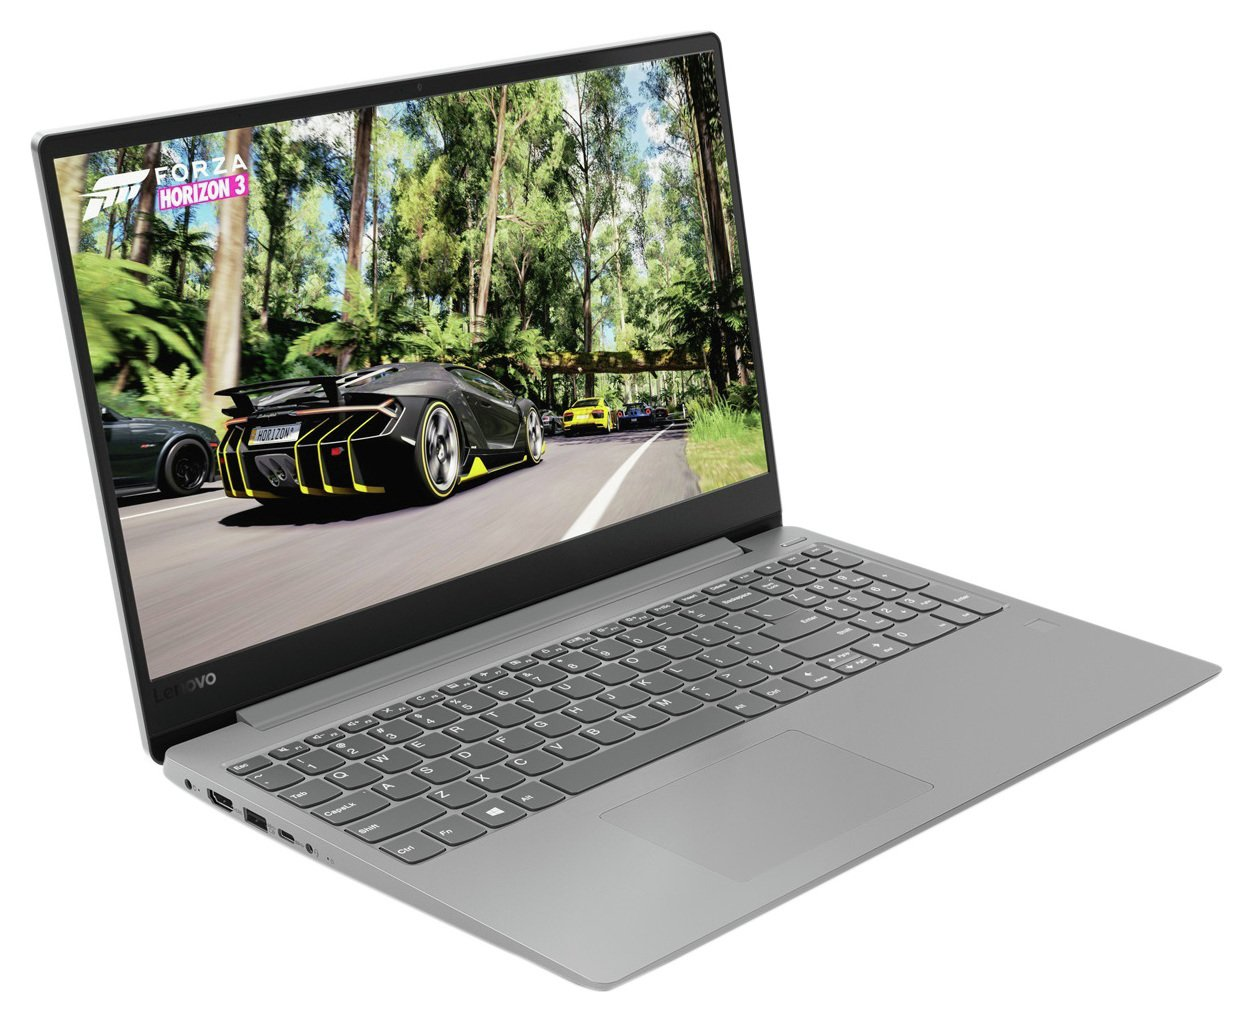 Lenovo IdeaPad 330S 15.6 Inch Ryzen 3 4GB 128GB Laptop- Grey Best Price and Cheapest